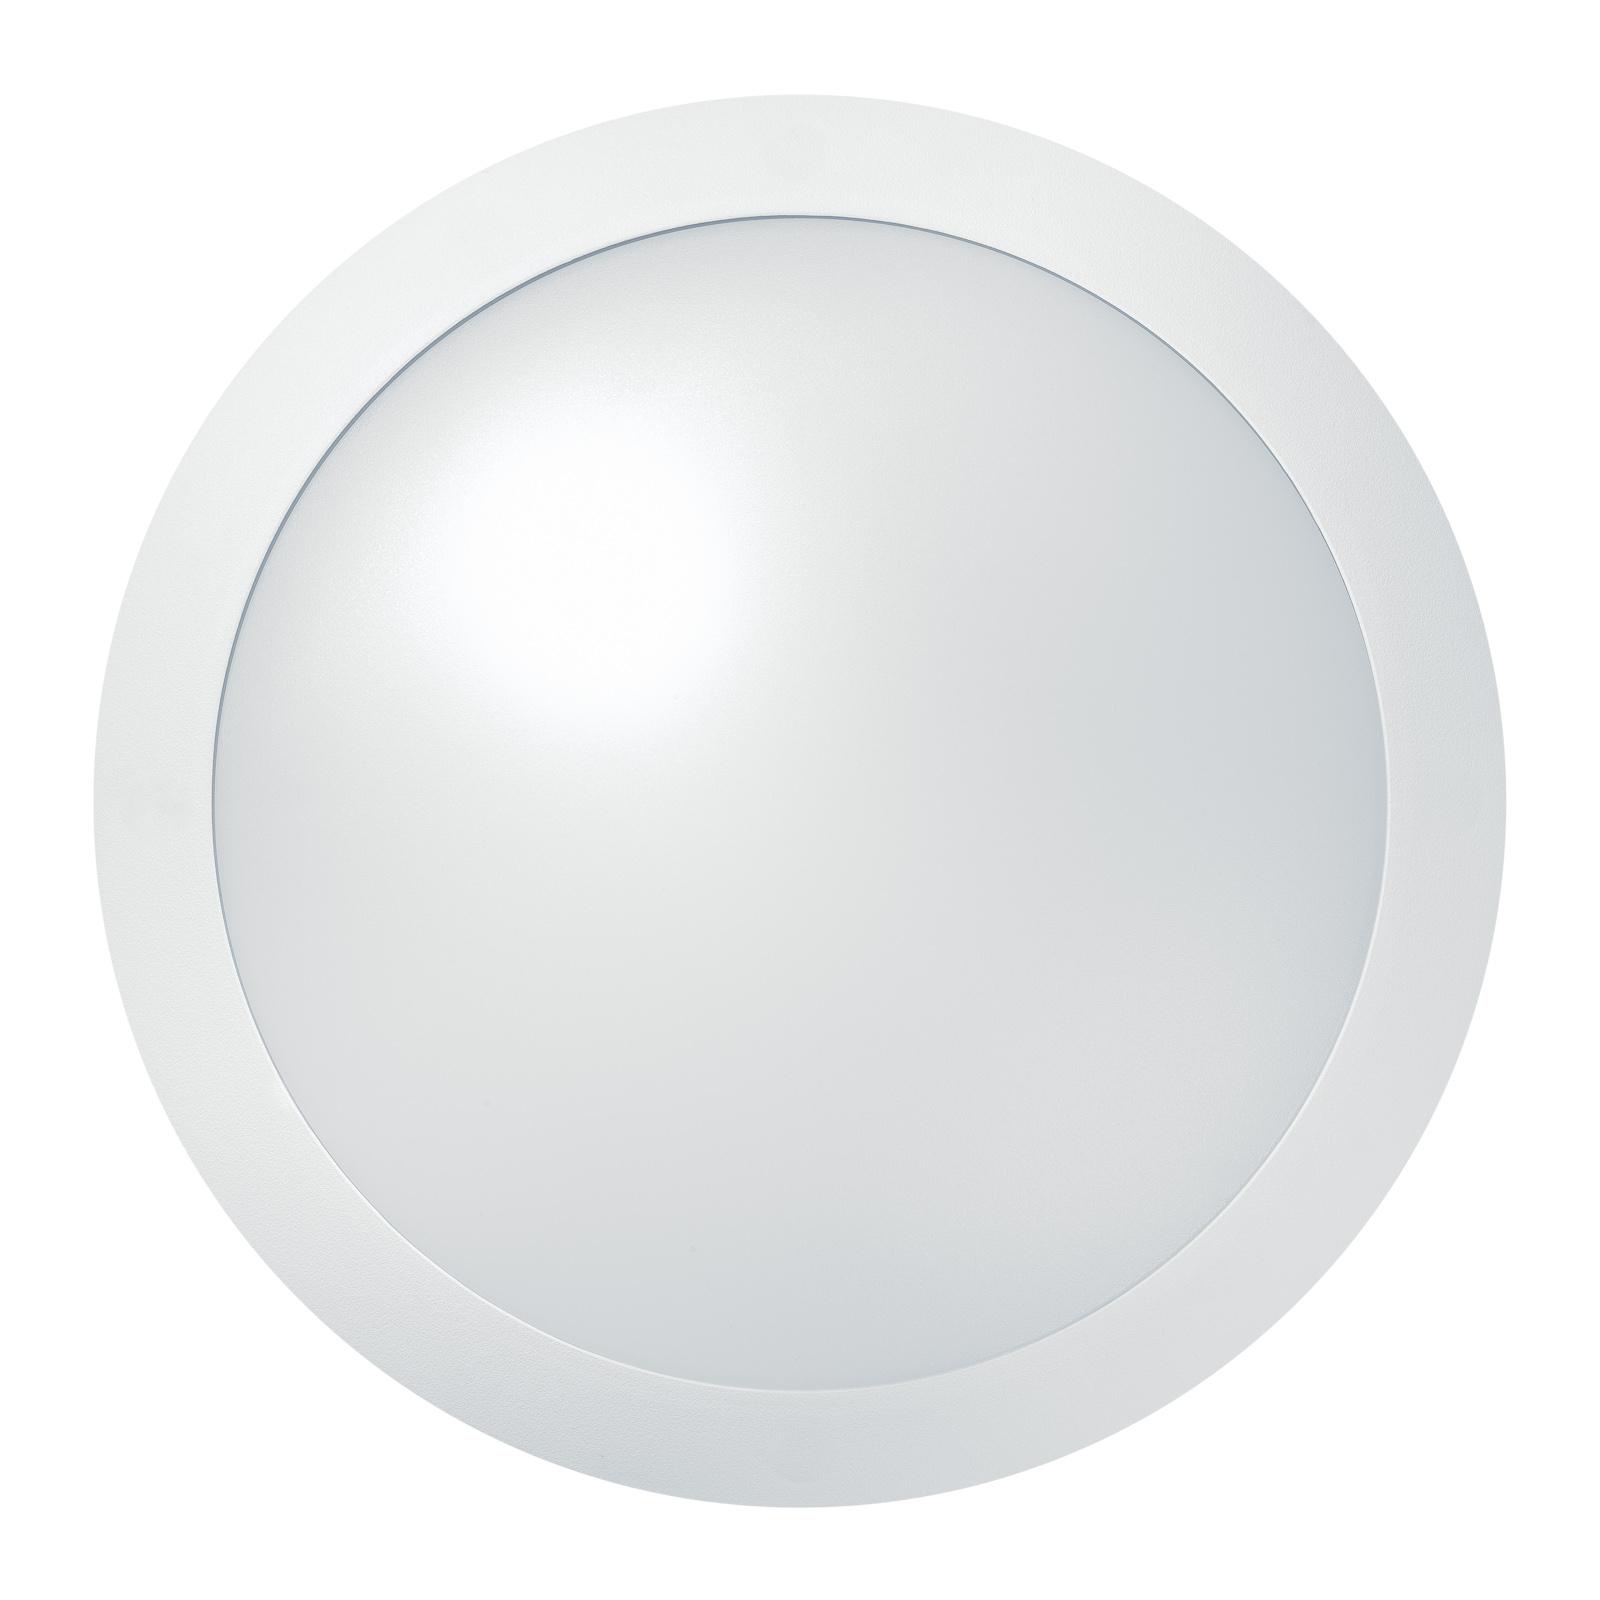 THORNeco Tom Vario LED-Wandleuchte 20W Sensor weiß